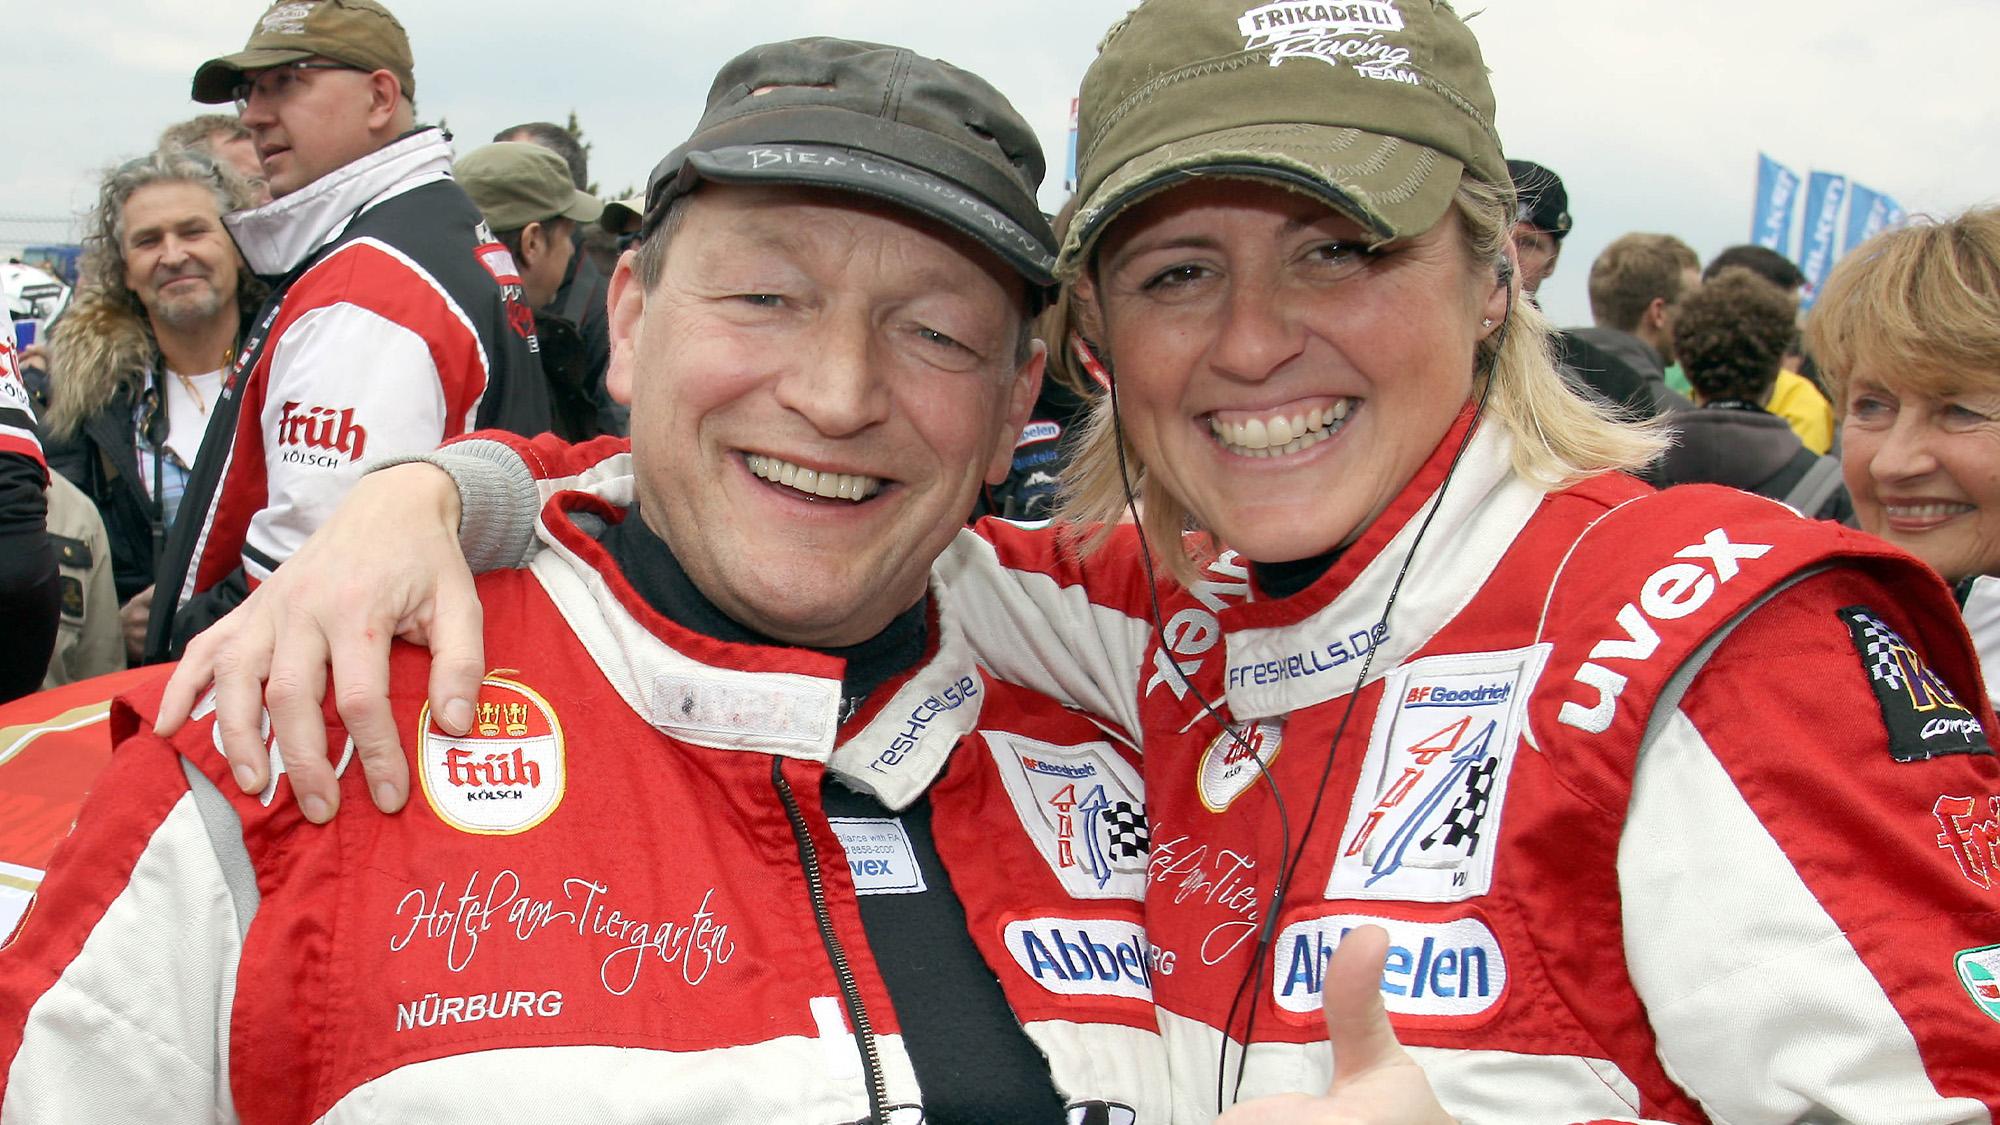 Sabine Schmitz with Klaus Abbelen